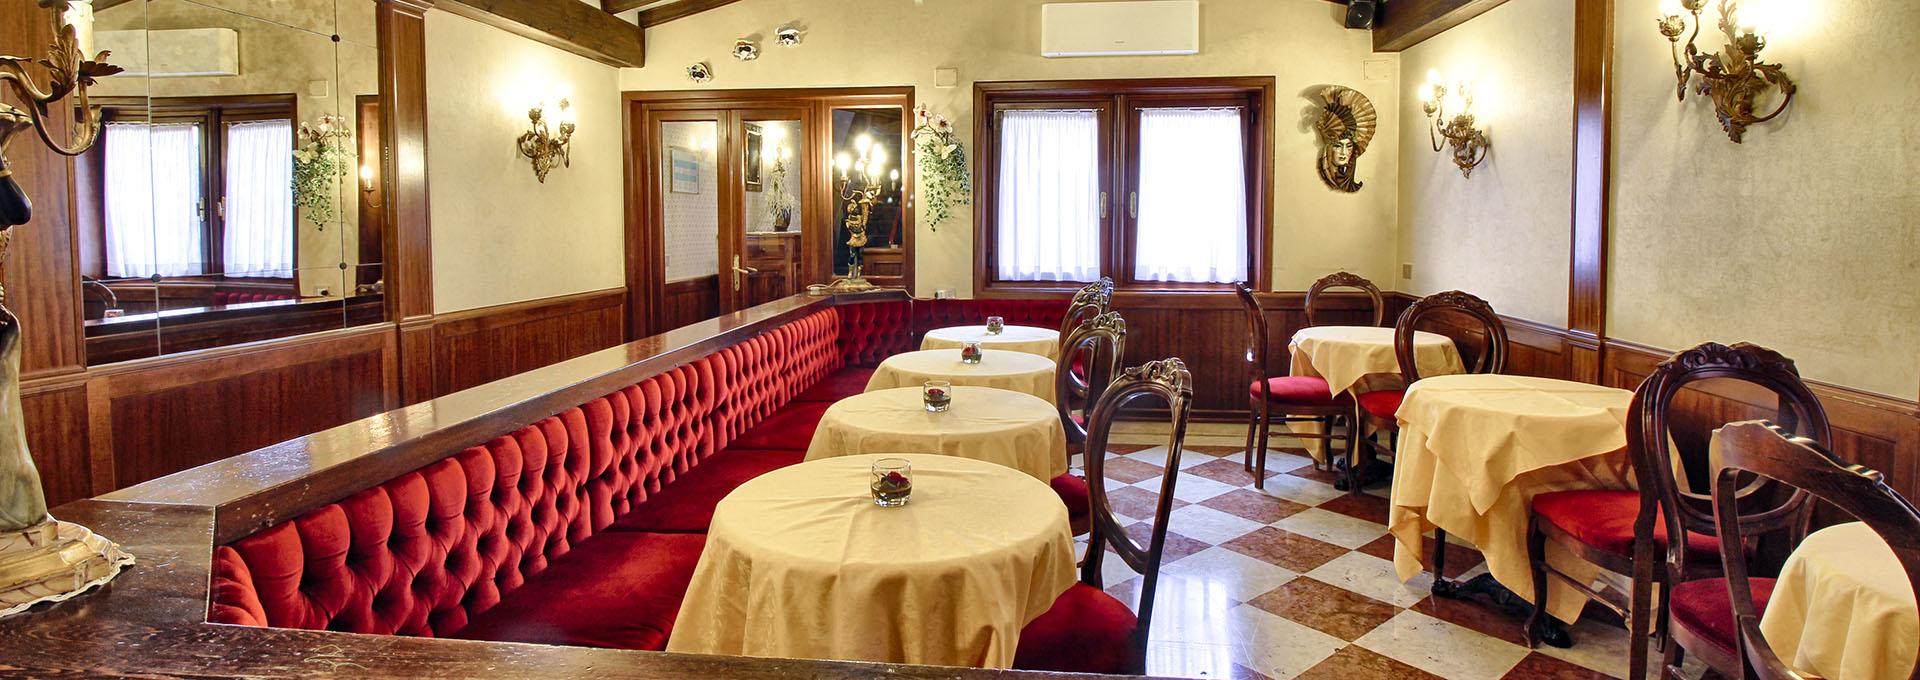 hotel 2 stelle venezia salone